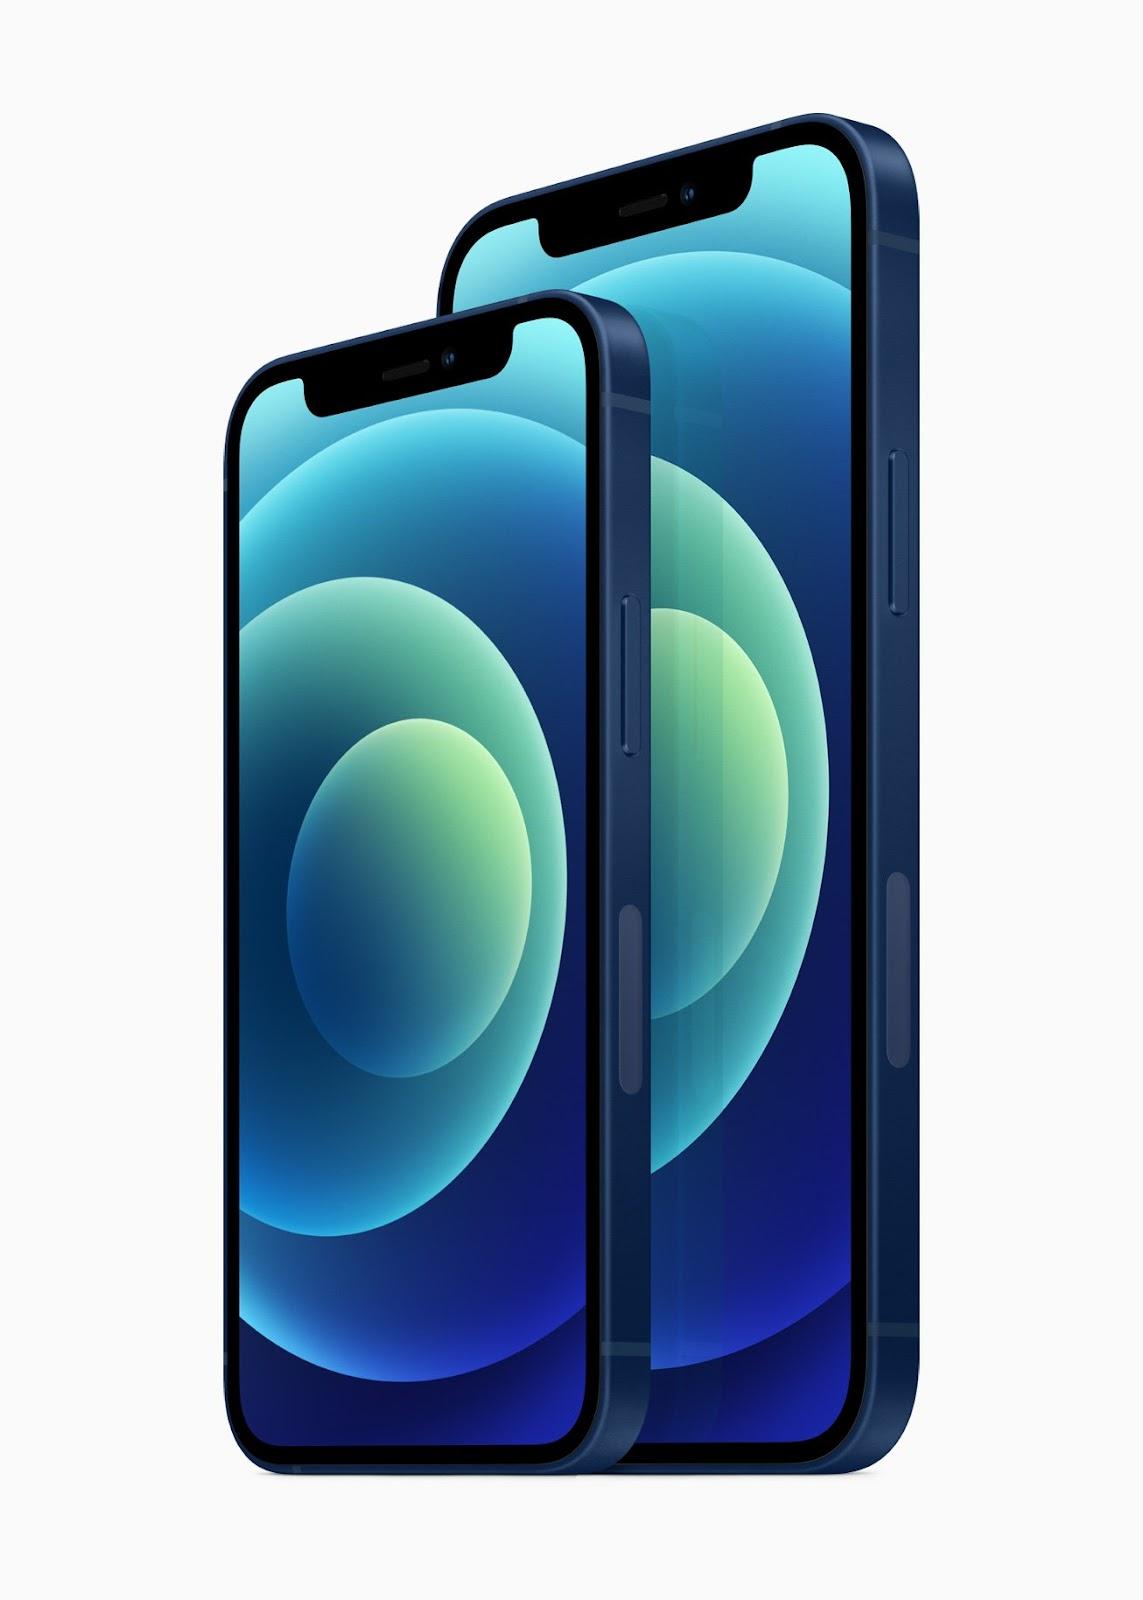 apple_iphone-12_2-up_10132020_inline.jpg.large_2x.jpg